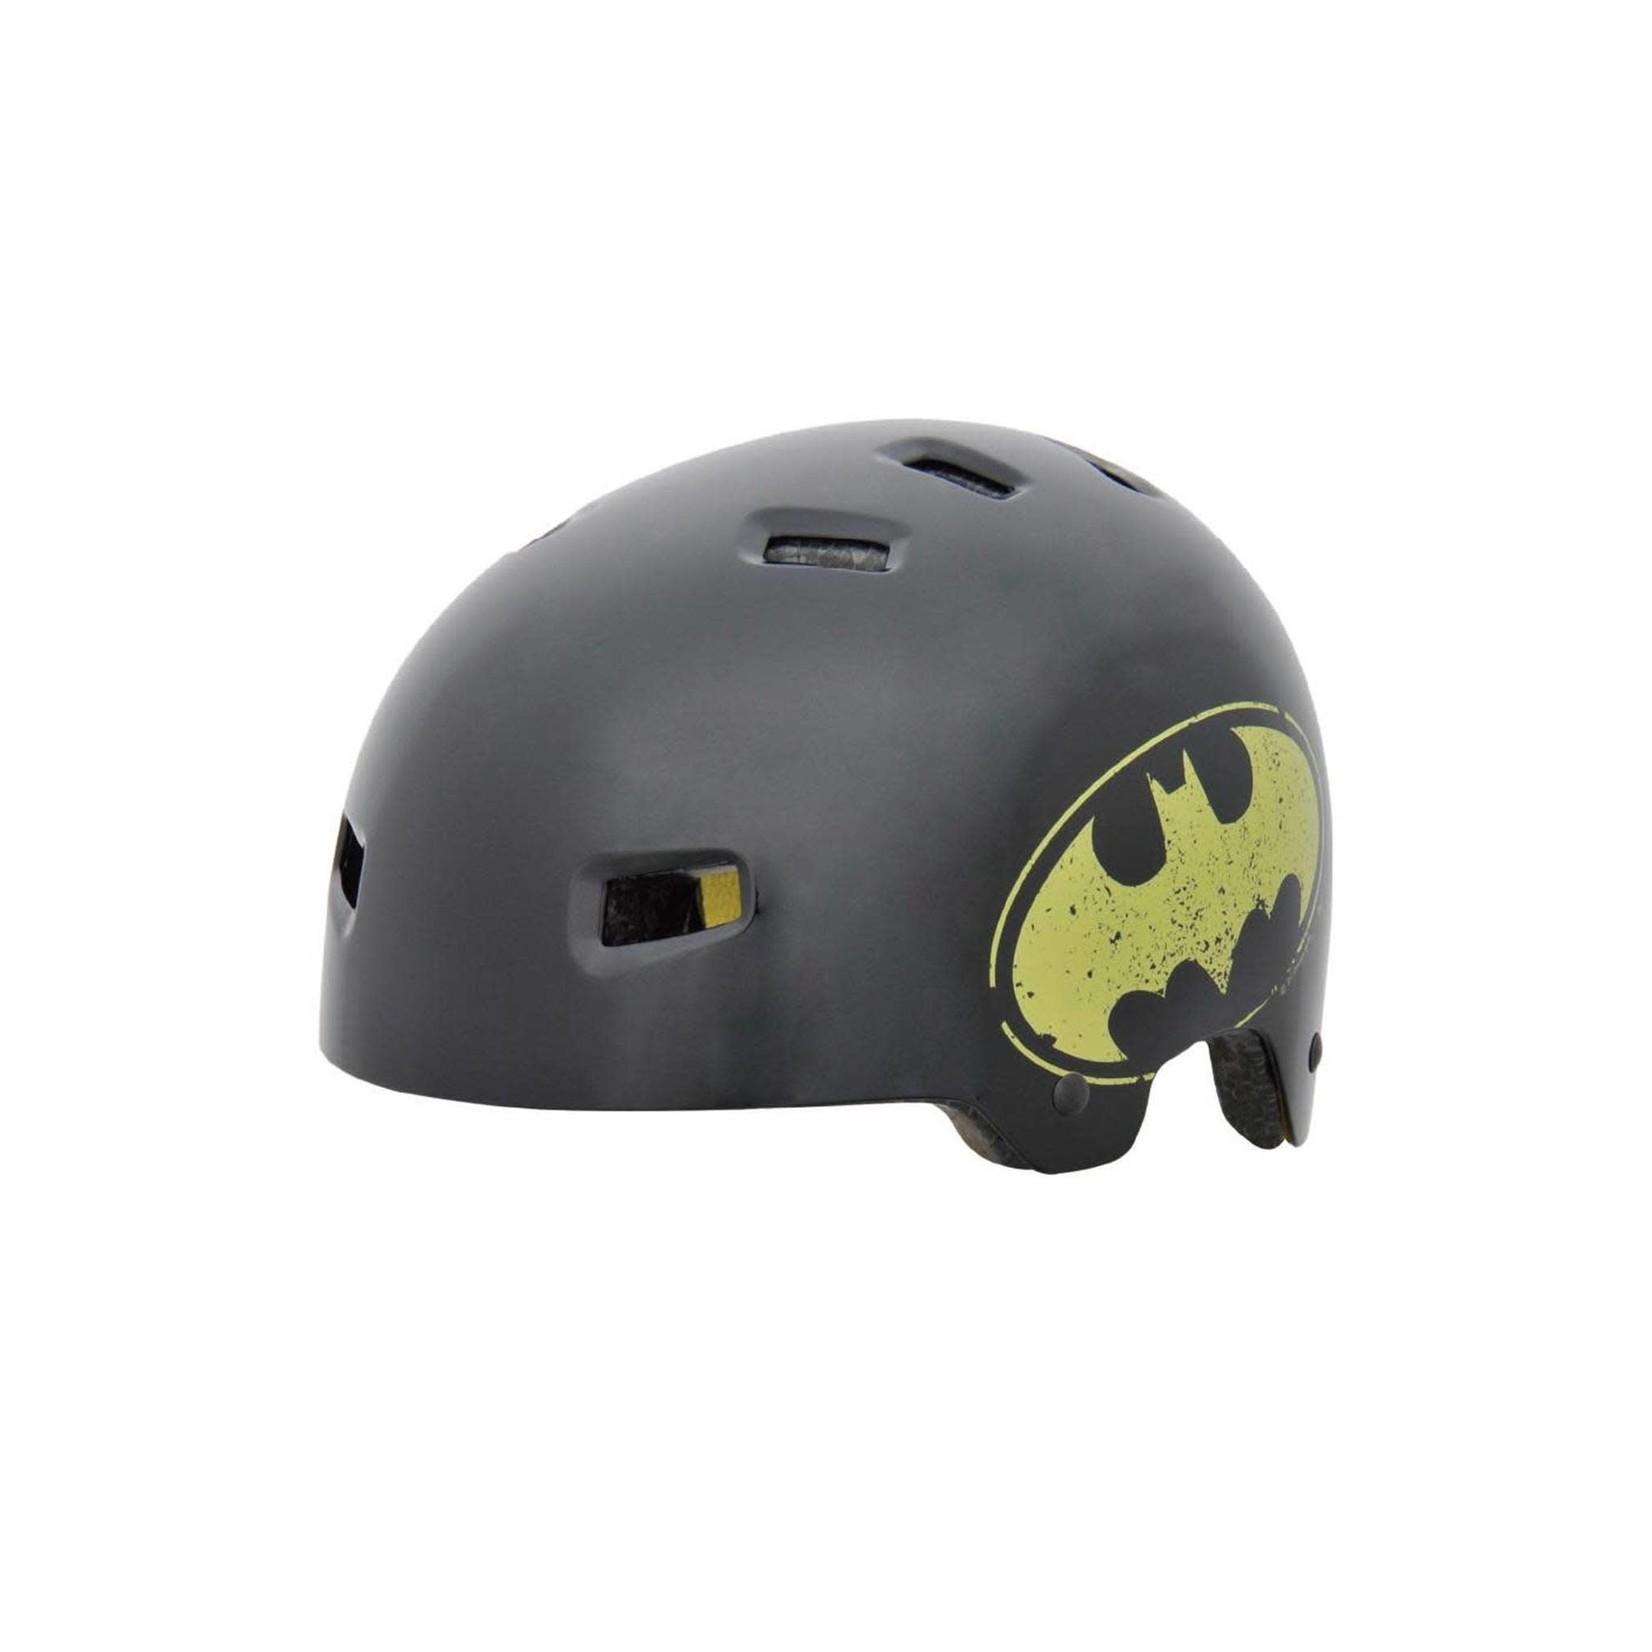 Azur T35 Kids 50-54cm Batman Helmet